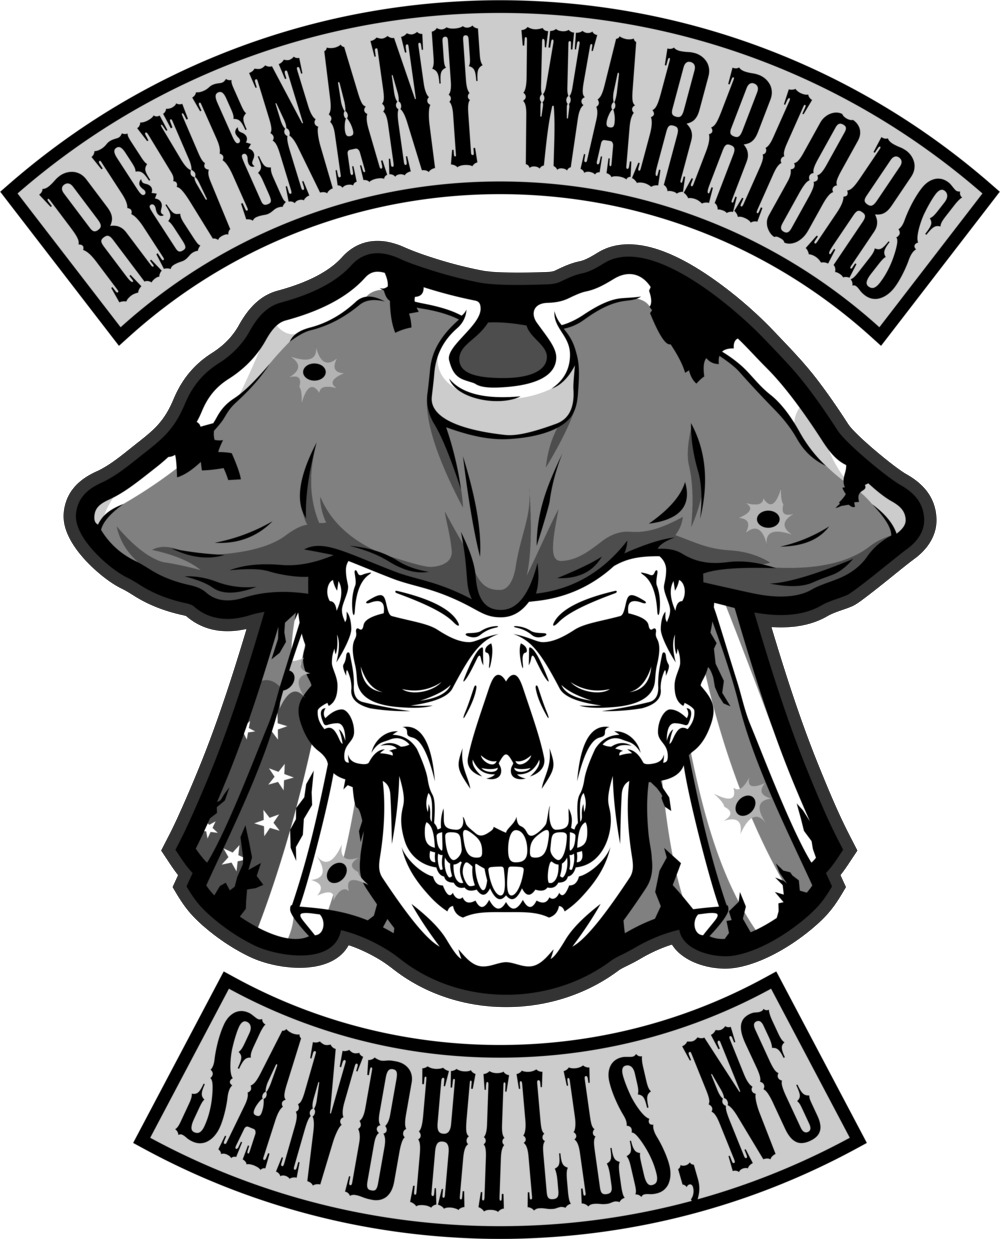 RevenantWarriorsPatch_FINAL_101717.PNG